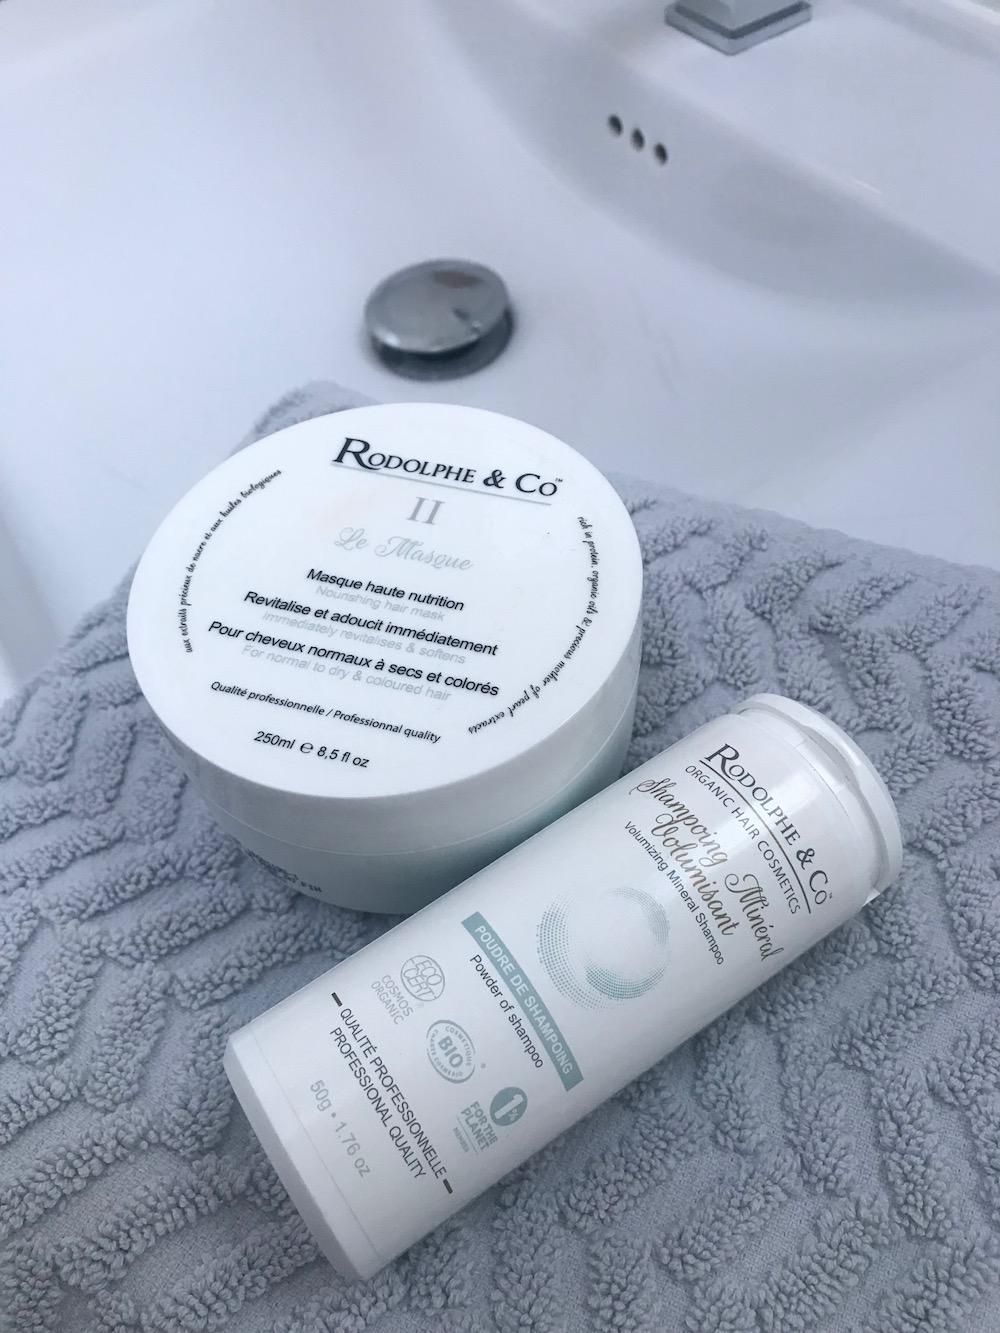 Rodolphe & Co Biologische shampoo